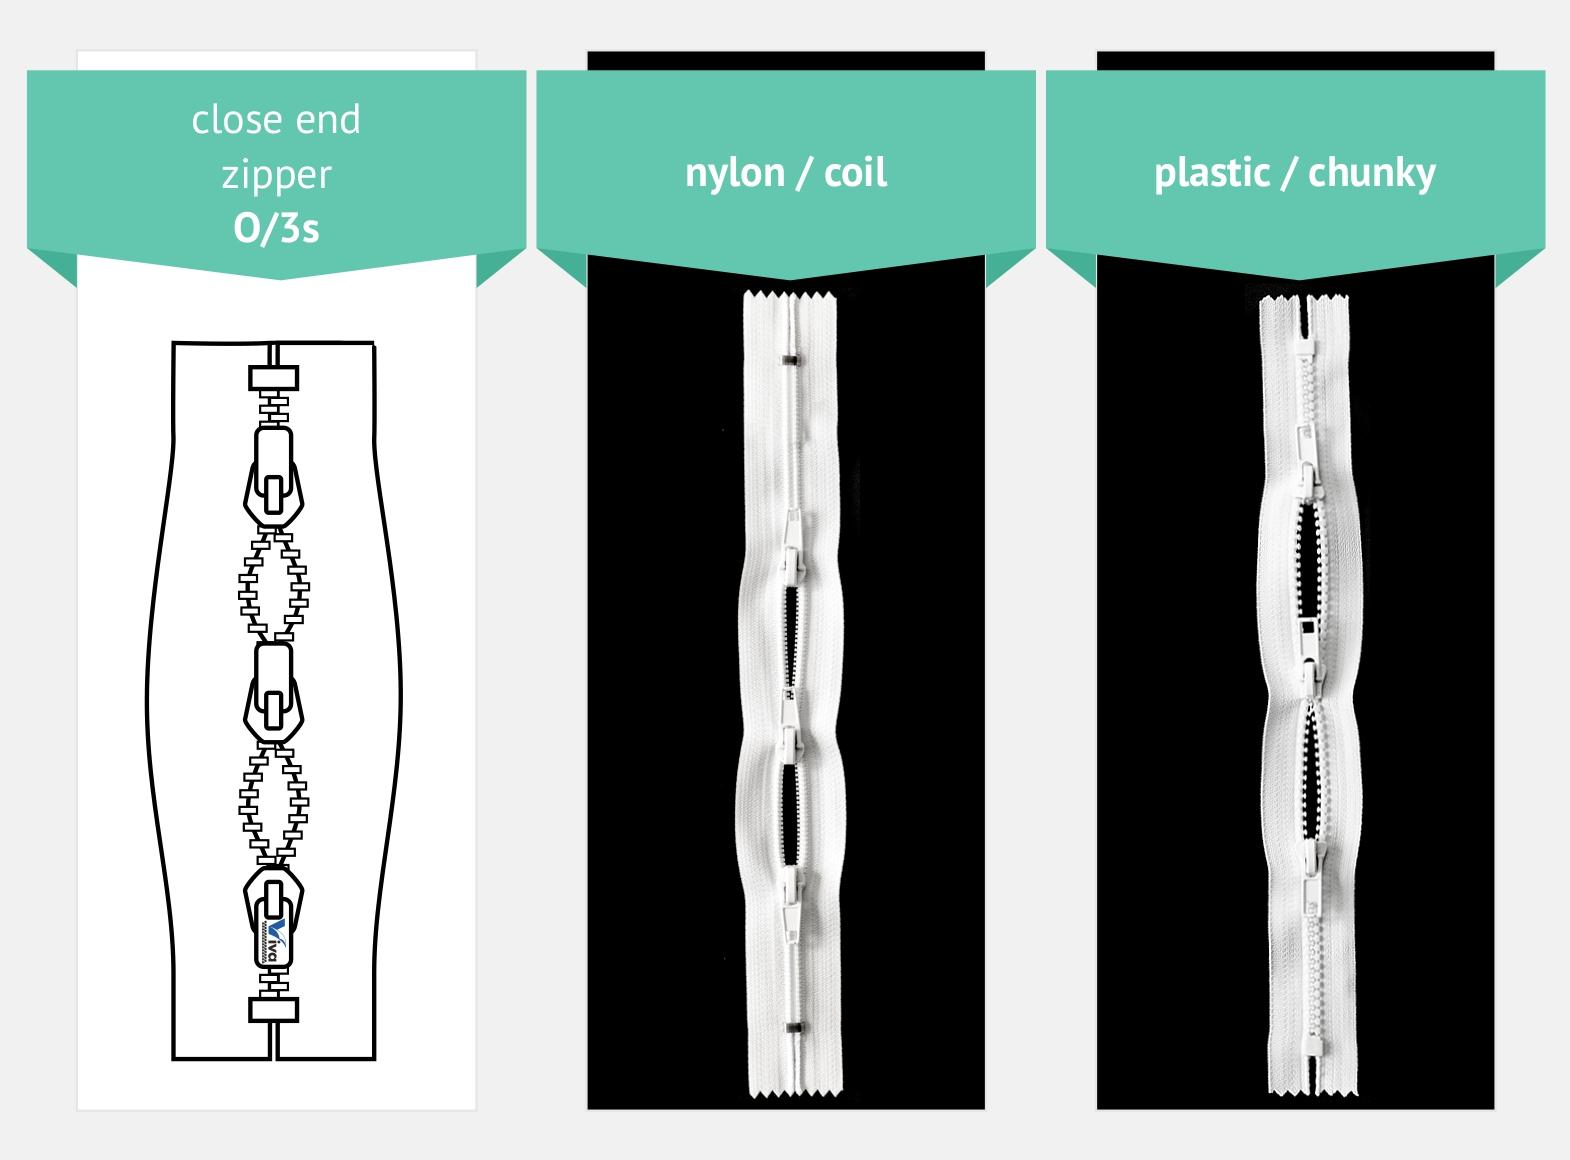 Zipper types close end O/3s